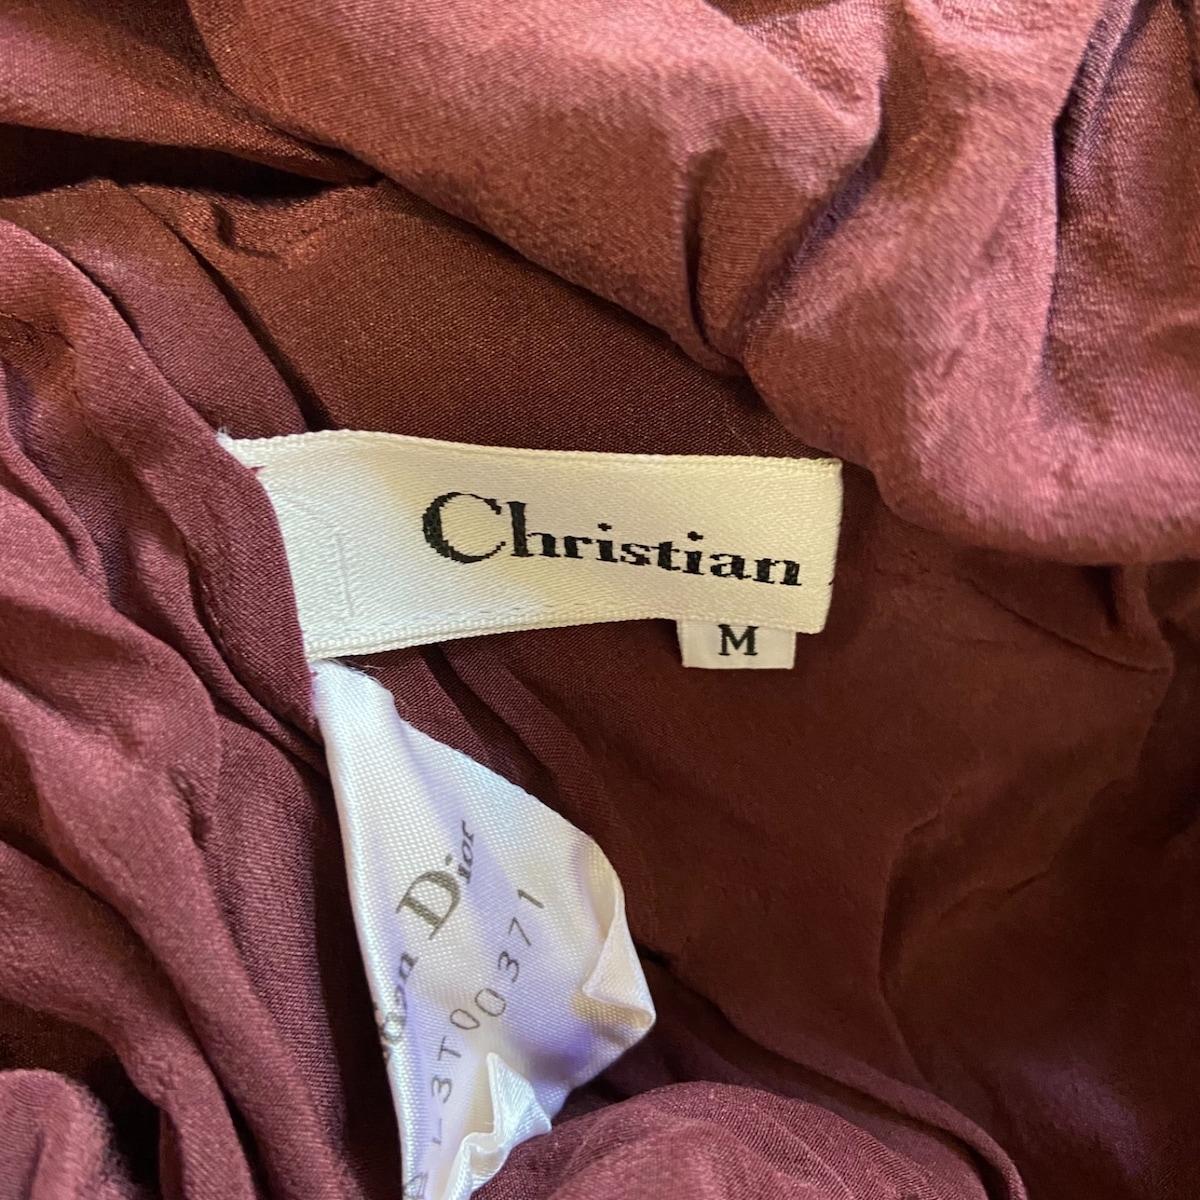 DIOR/ChristianDior(ディオール/クリスチャンディオール)のカットソー